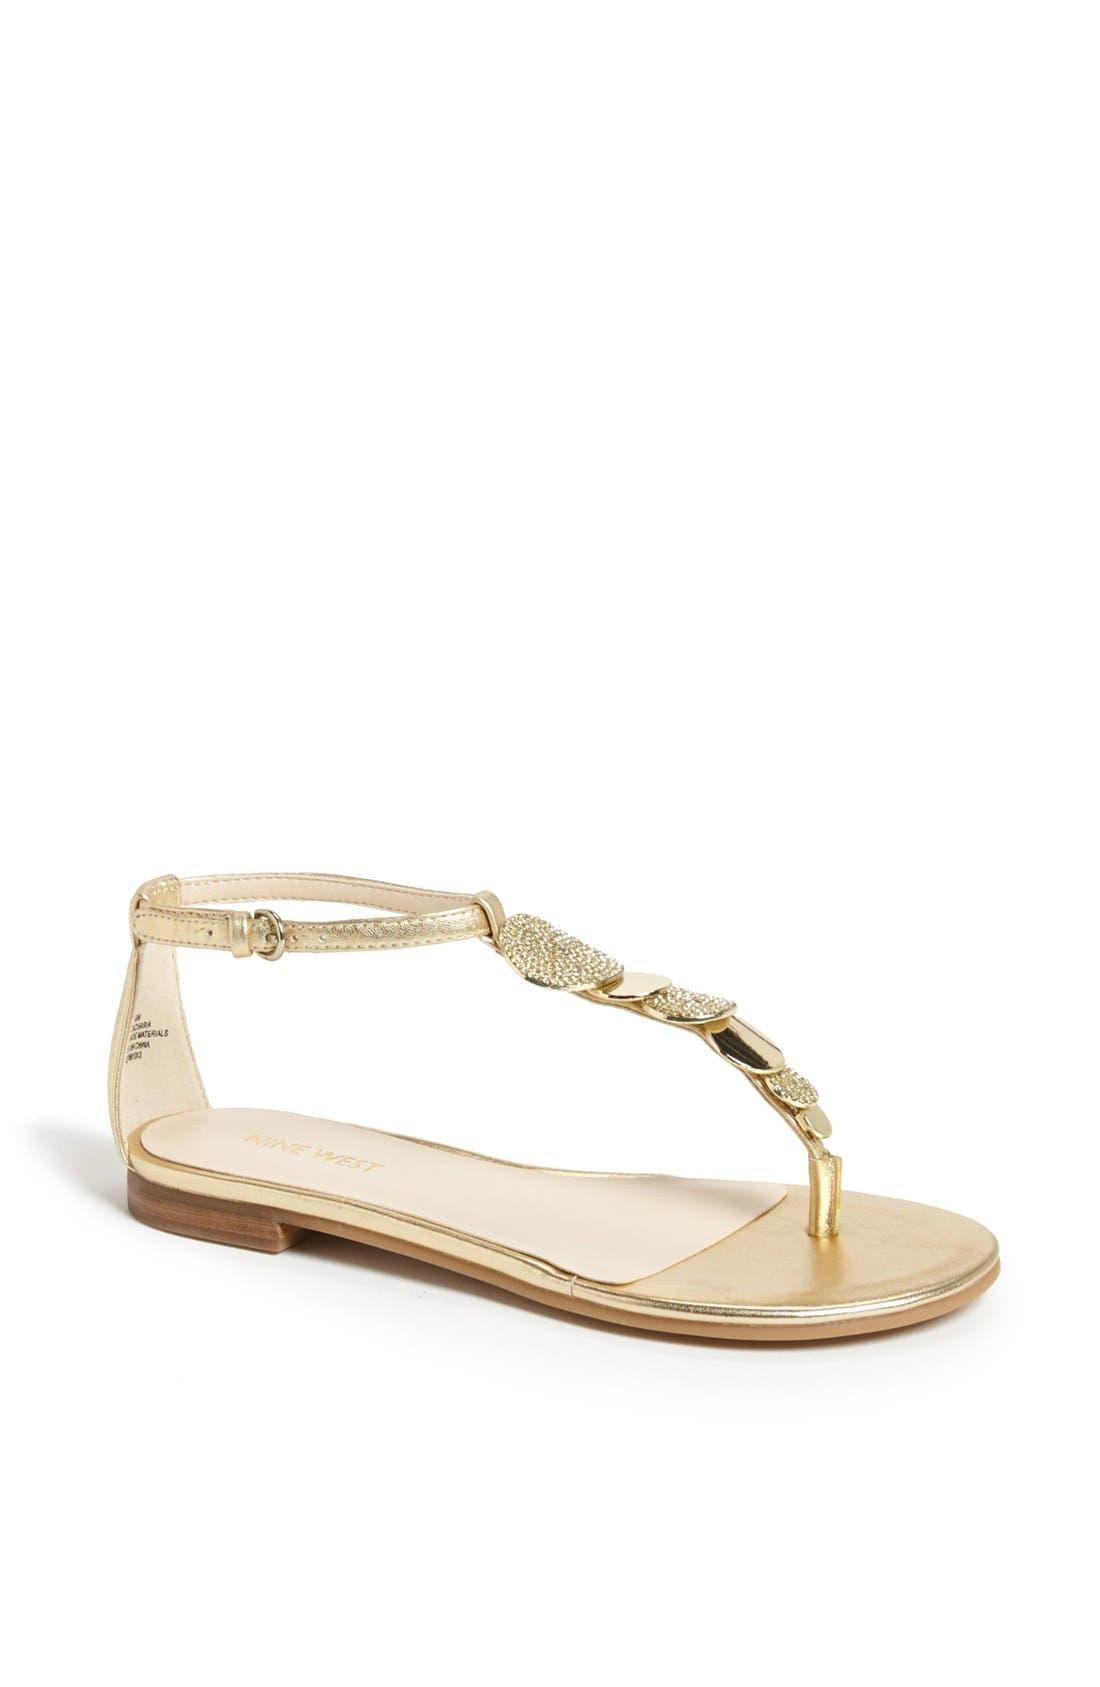 Main Image - Nine West 'Zacharia' Thong Sandal